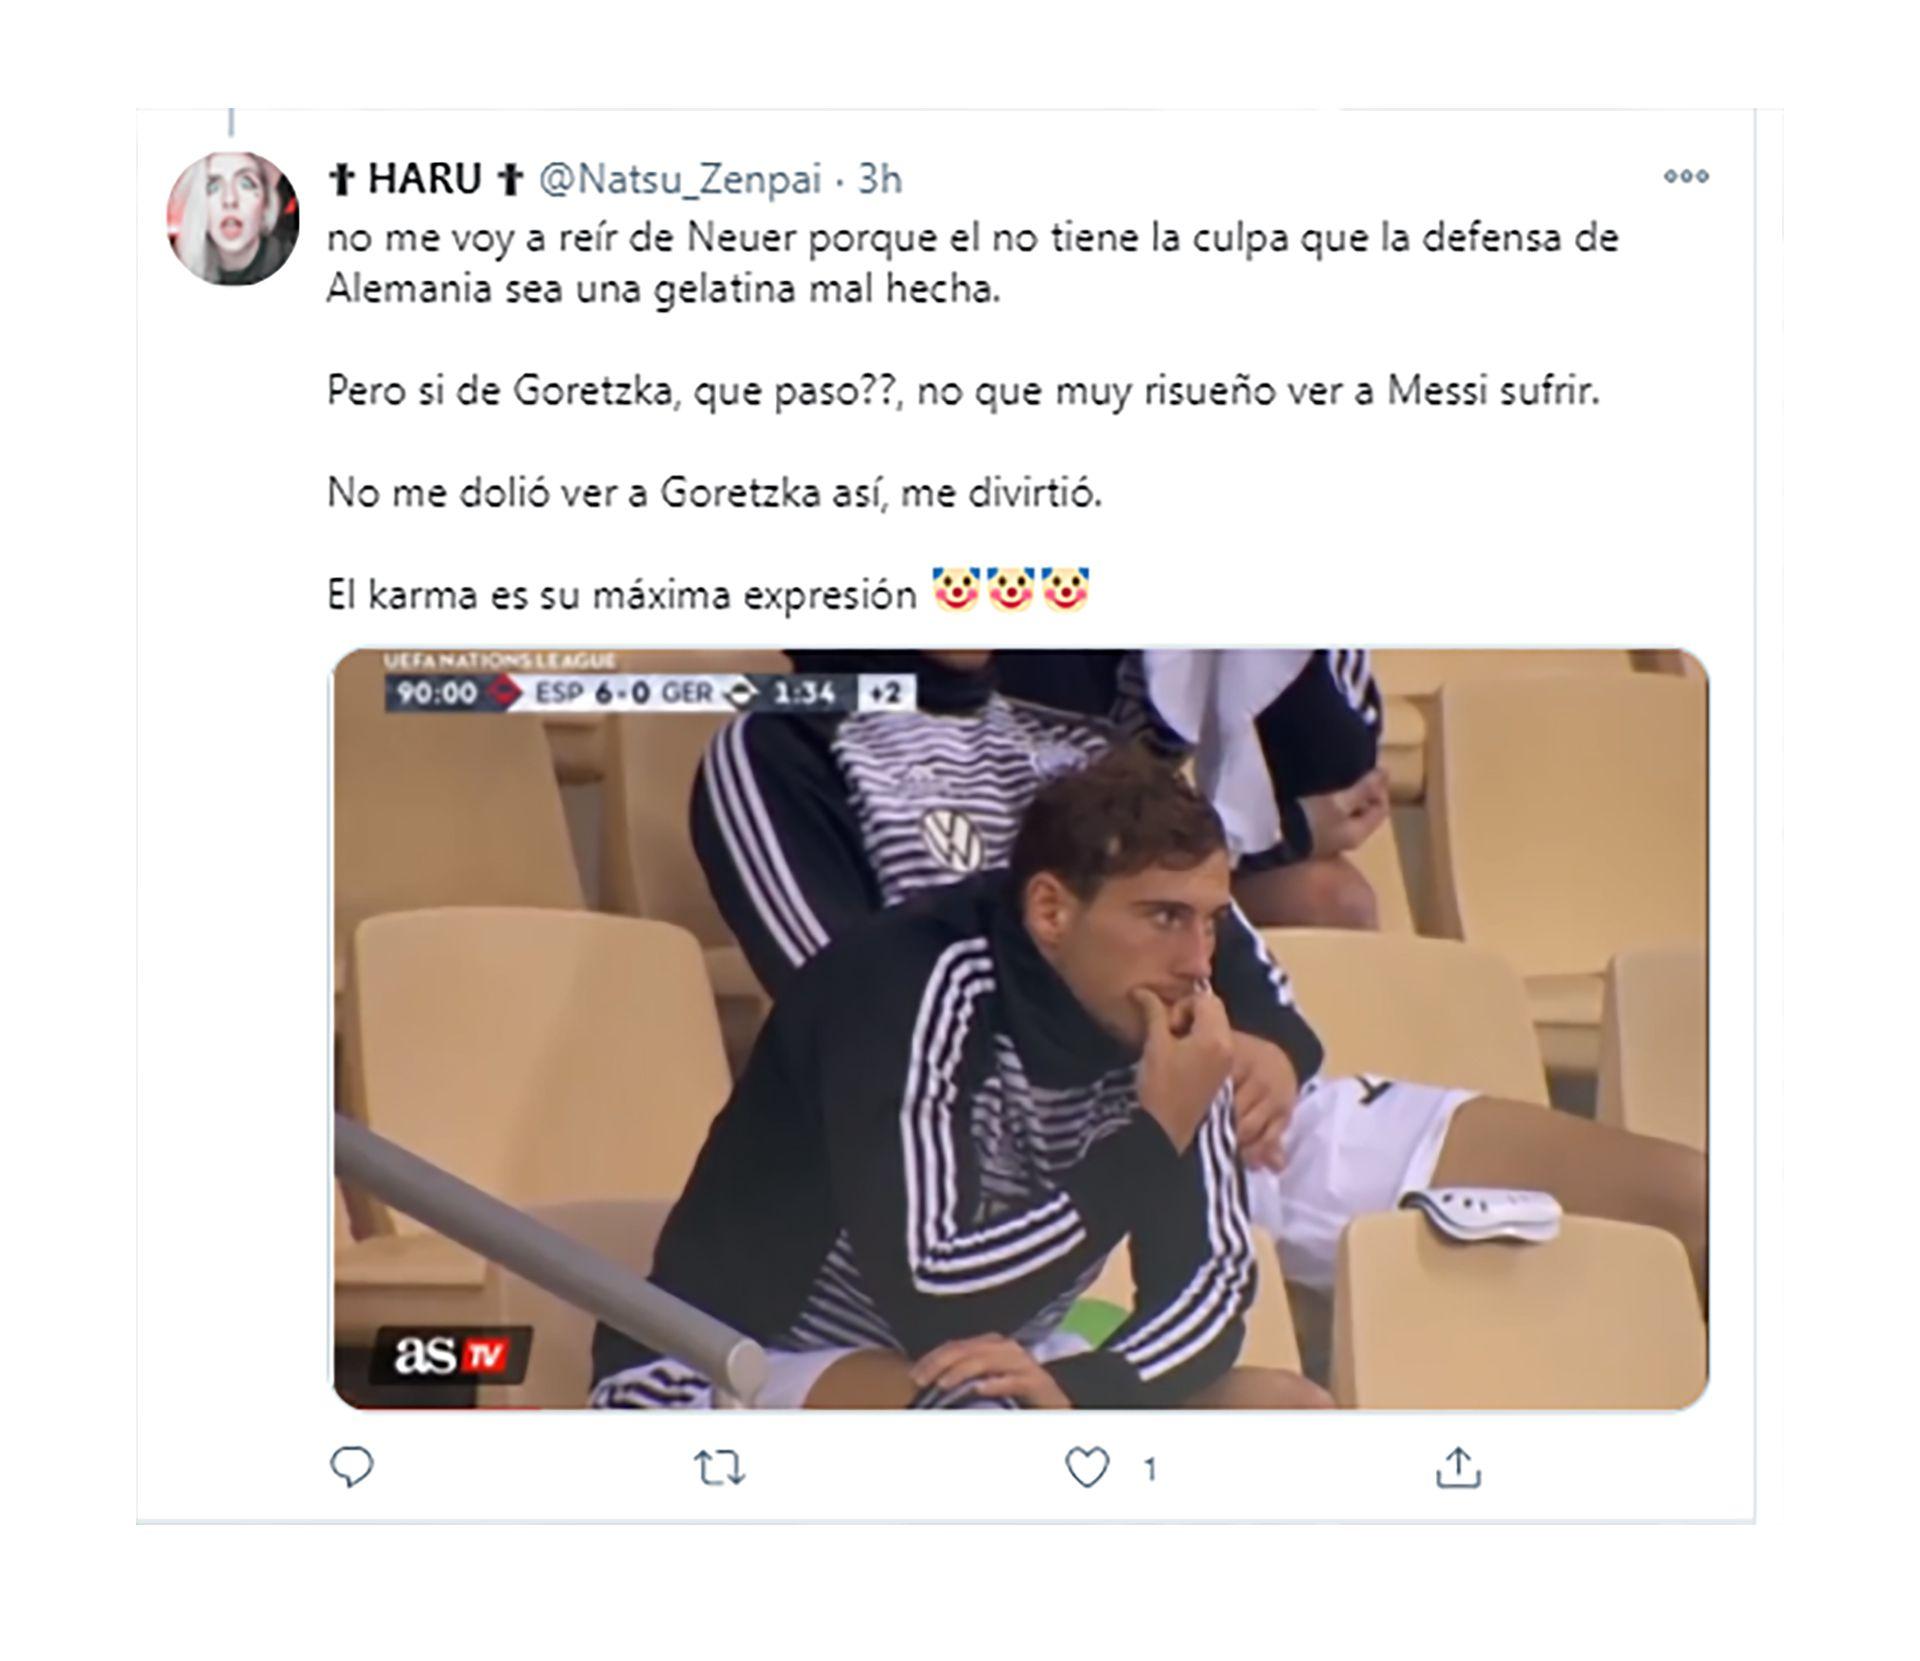 memes León Goretzka por el 0-6 de Alemania contra España